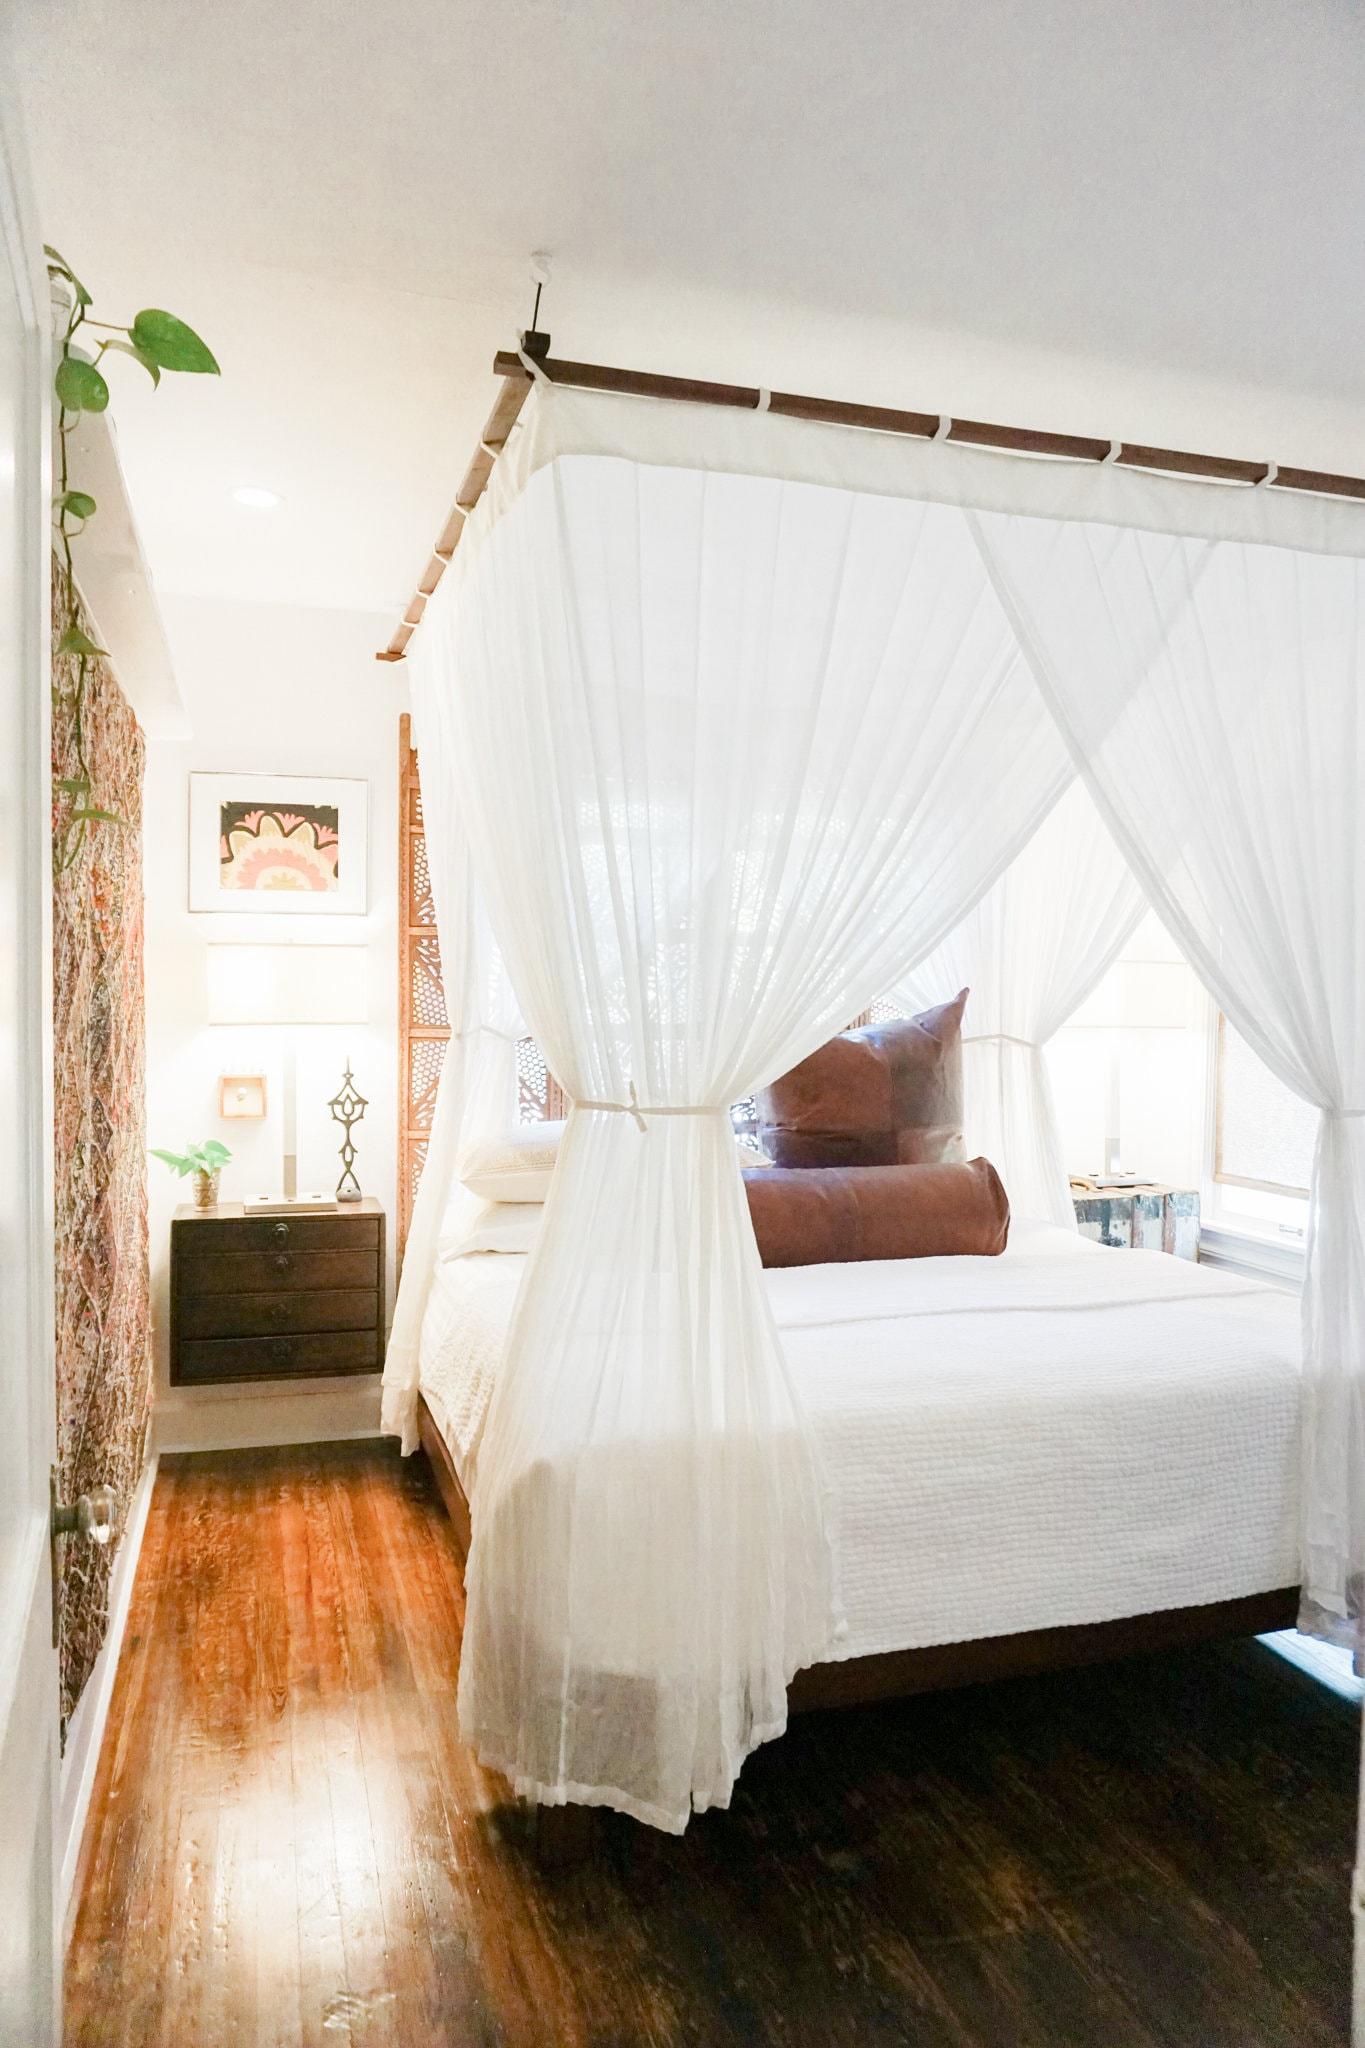 ARTAYASA // Bed Canopy Hanging Luxury Cotton Mosquito Net